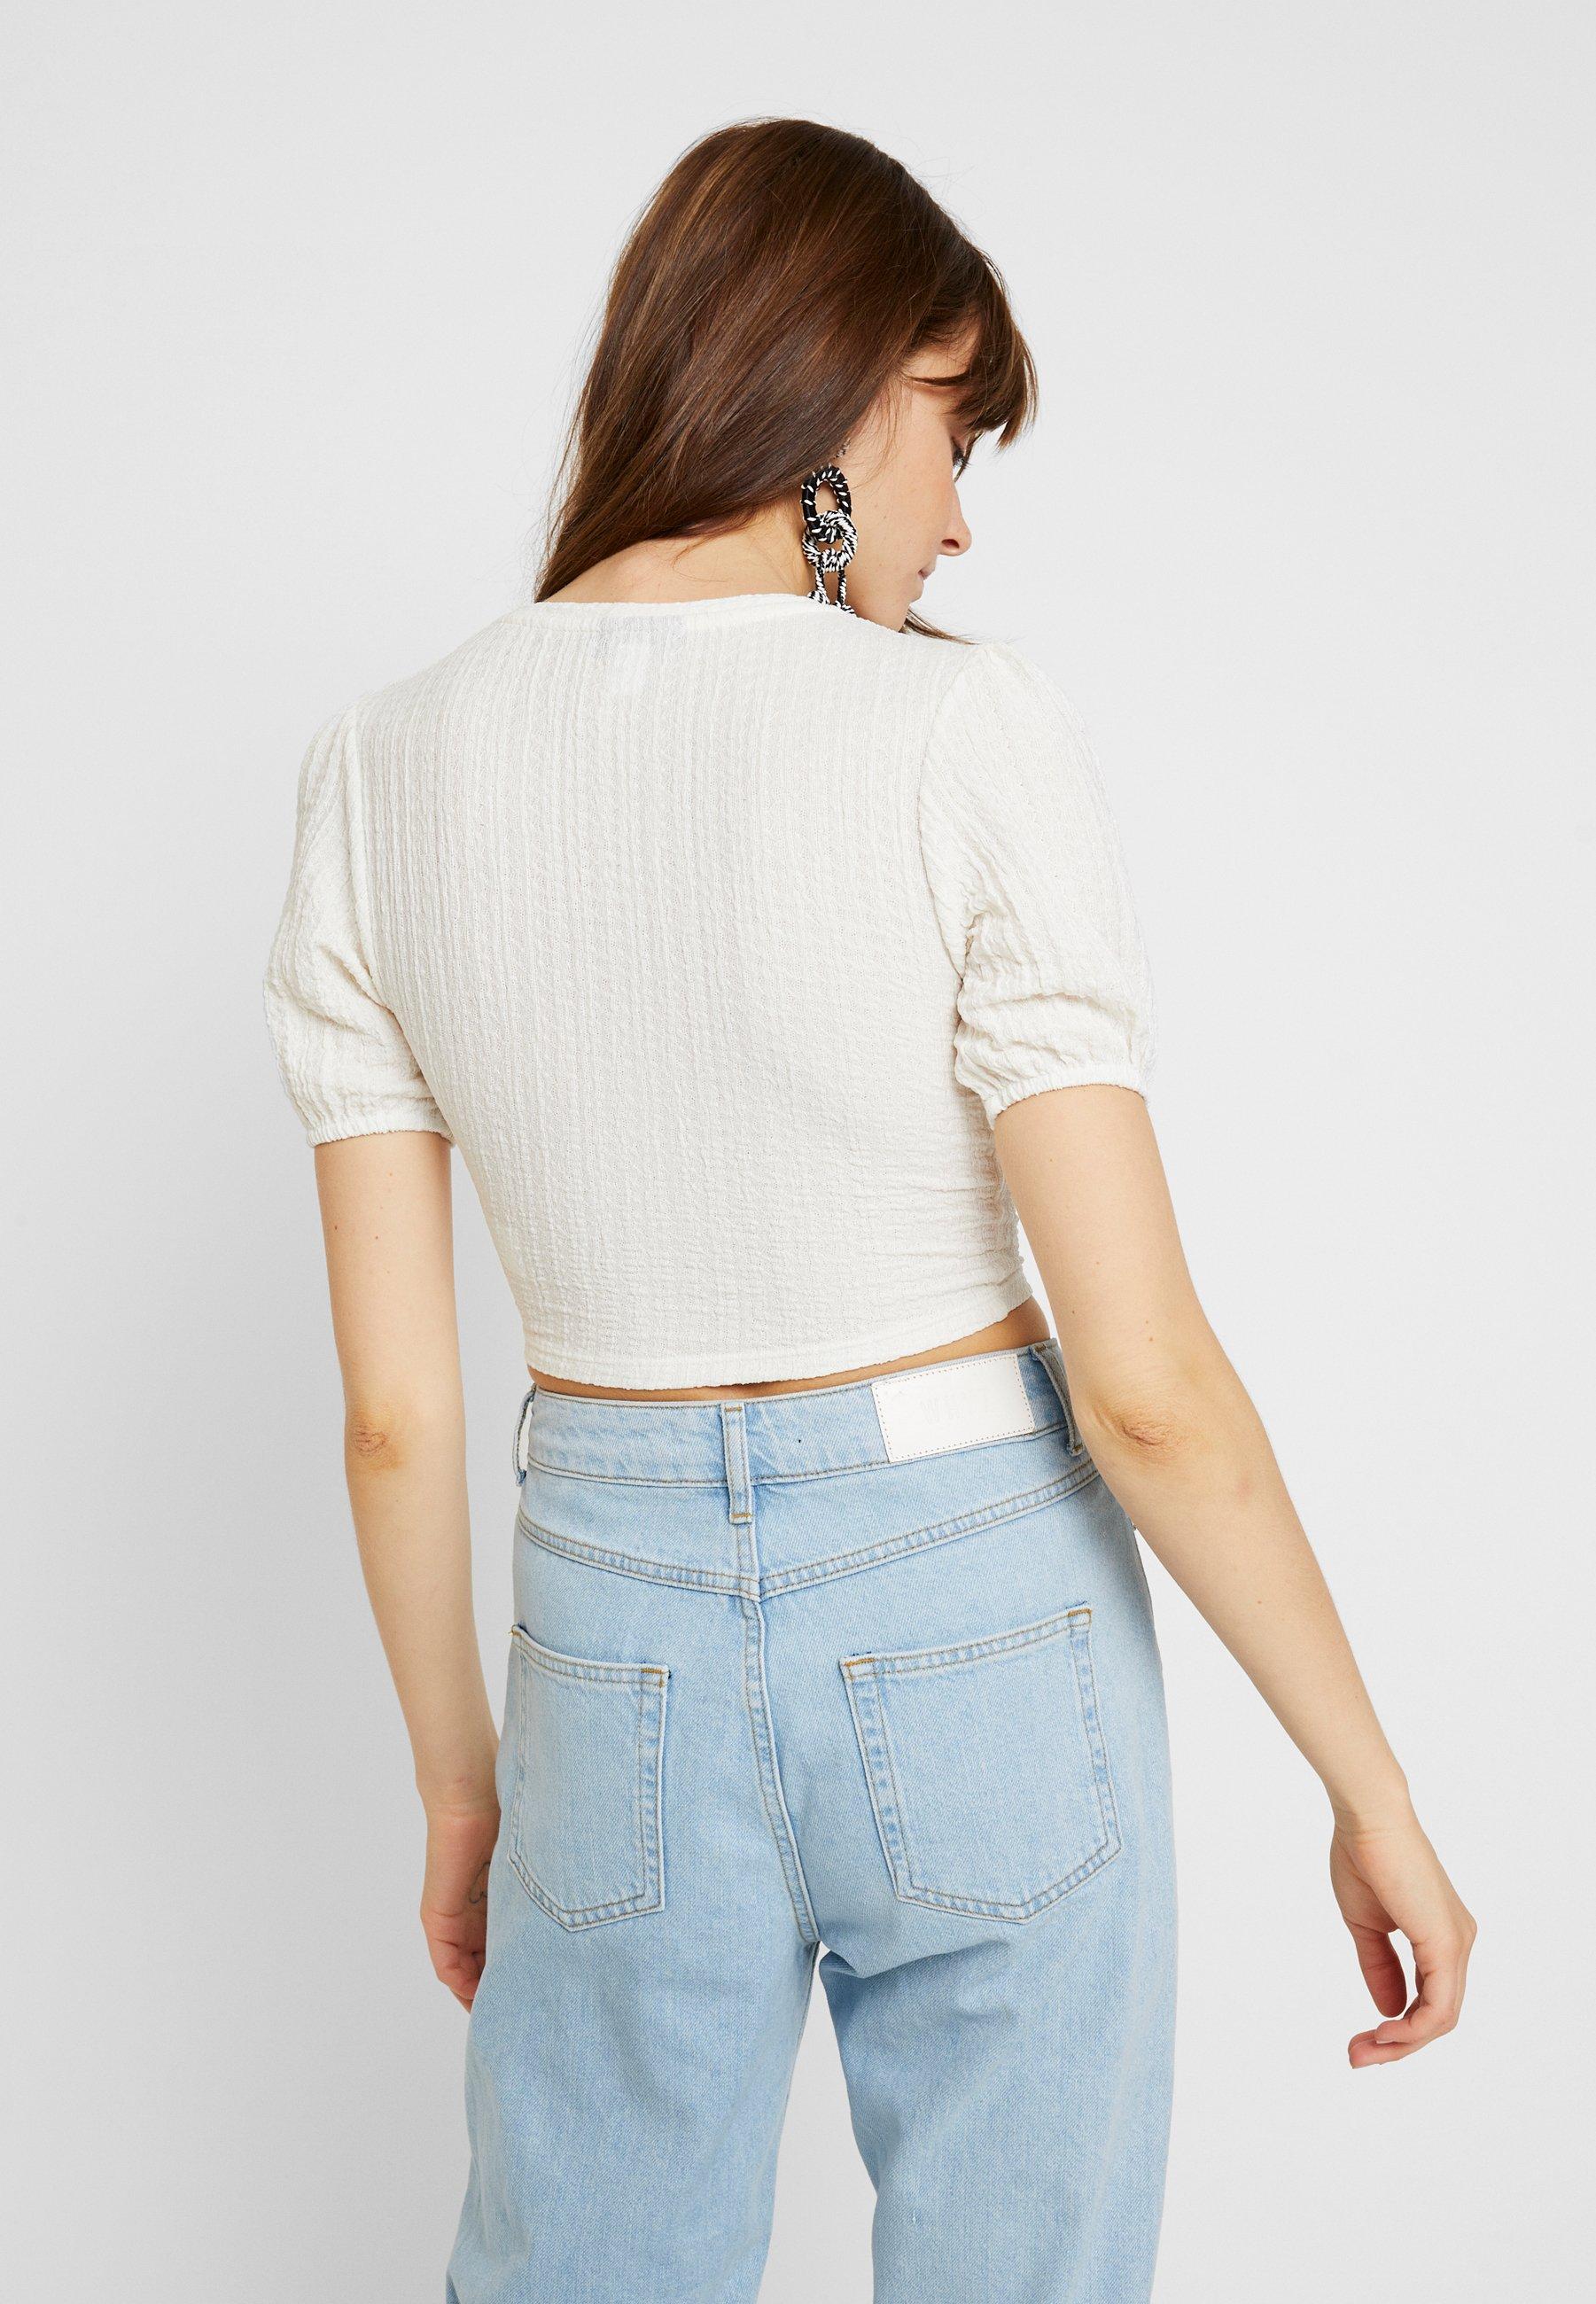 Topshop Imprimé SleeveT shirt Puff Cream TKlJc3F1